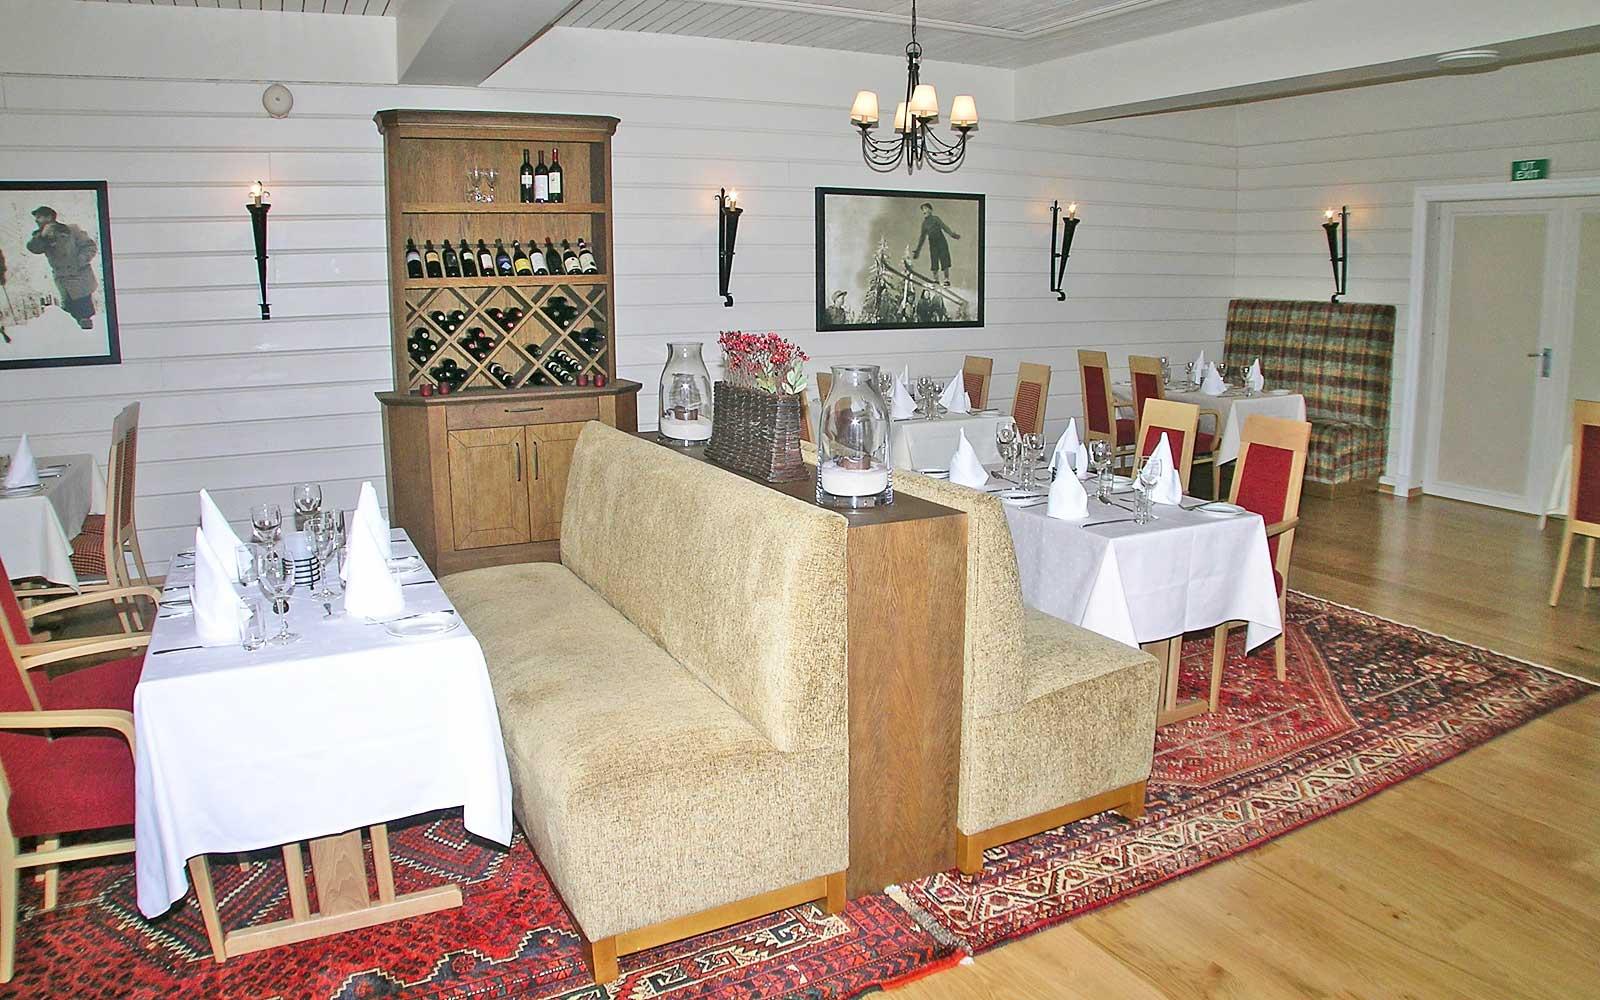 Trysil-Knut Hotell restaurant 2 Sjumilskogen booking Trysil